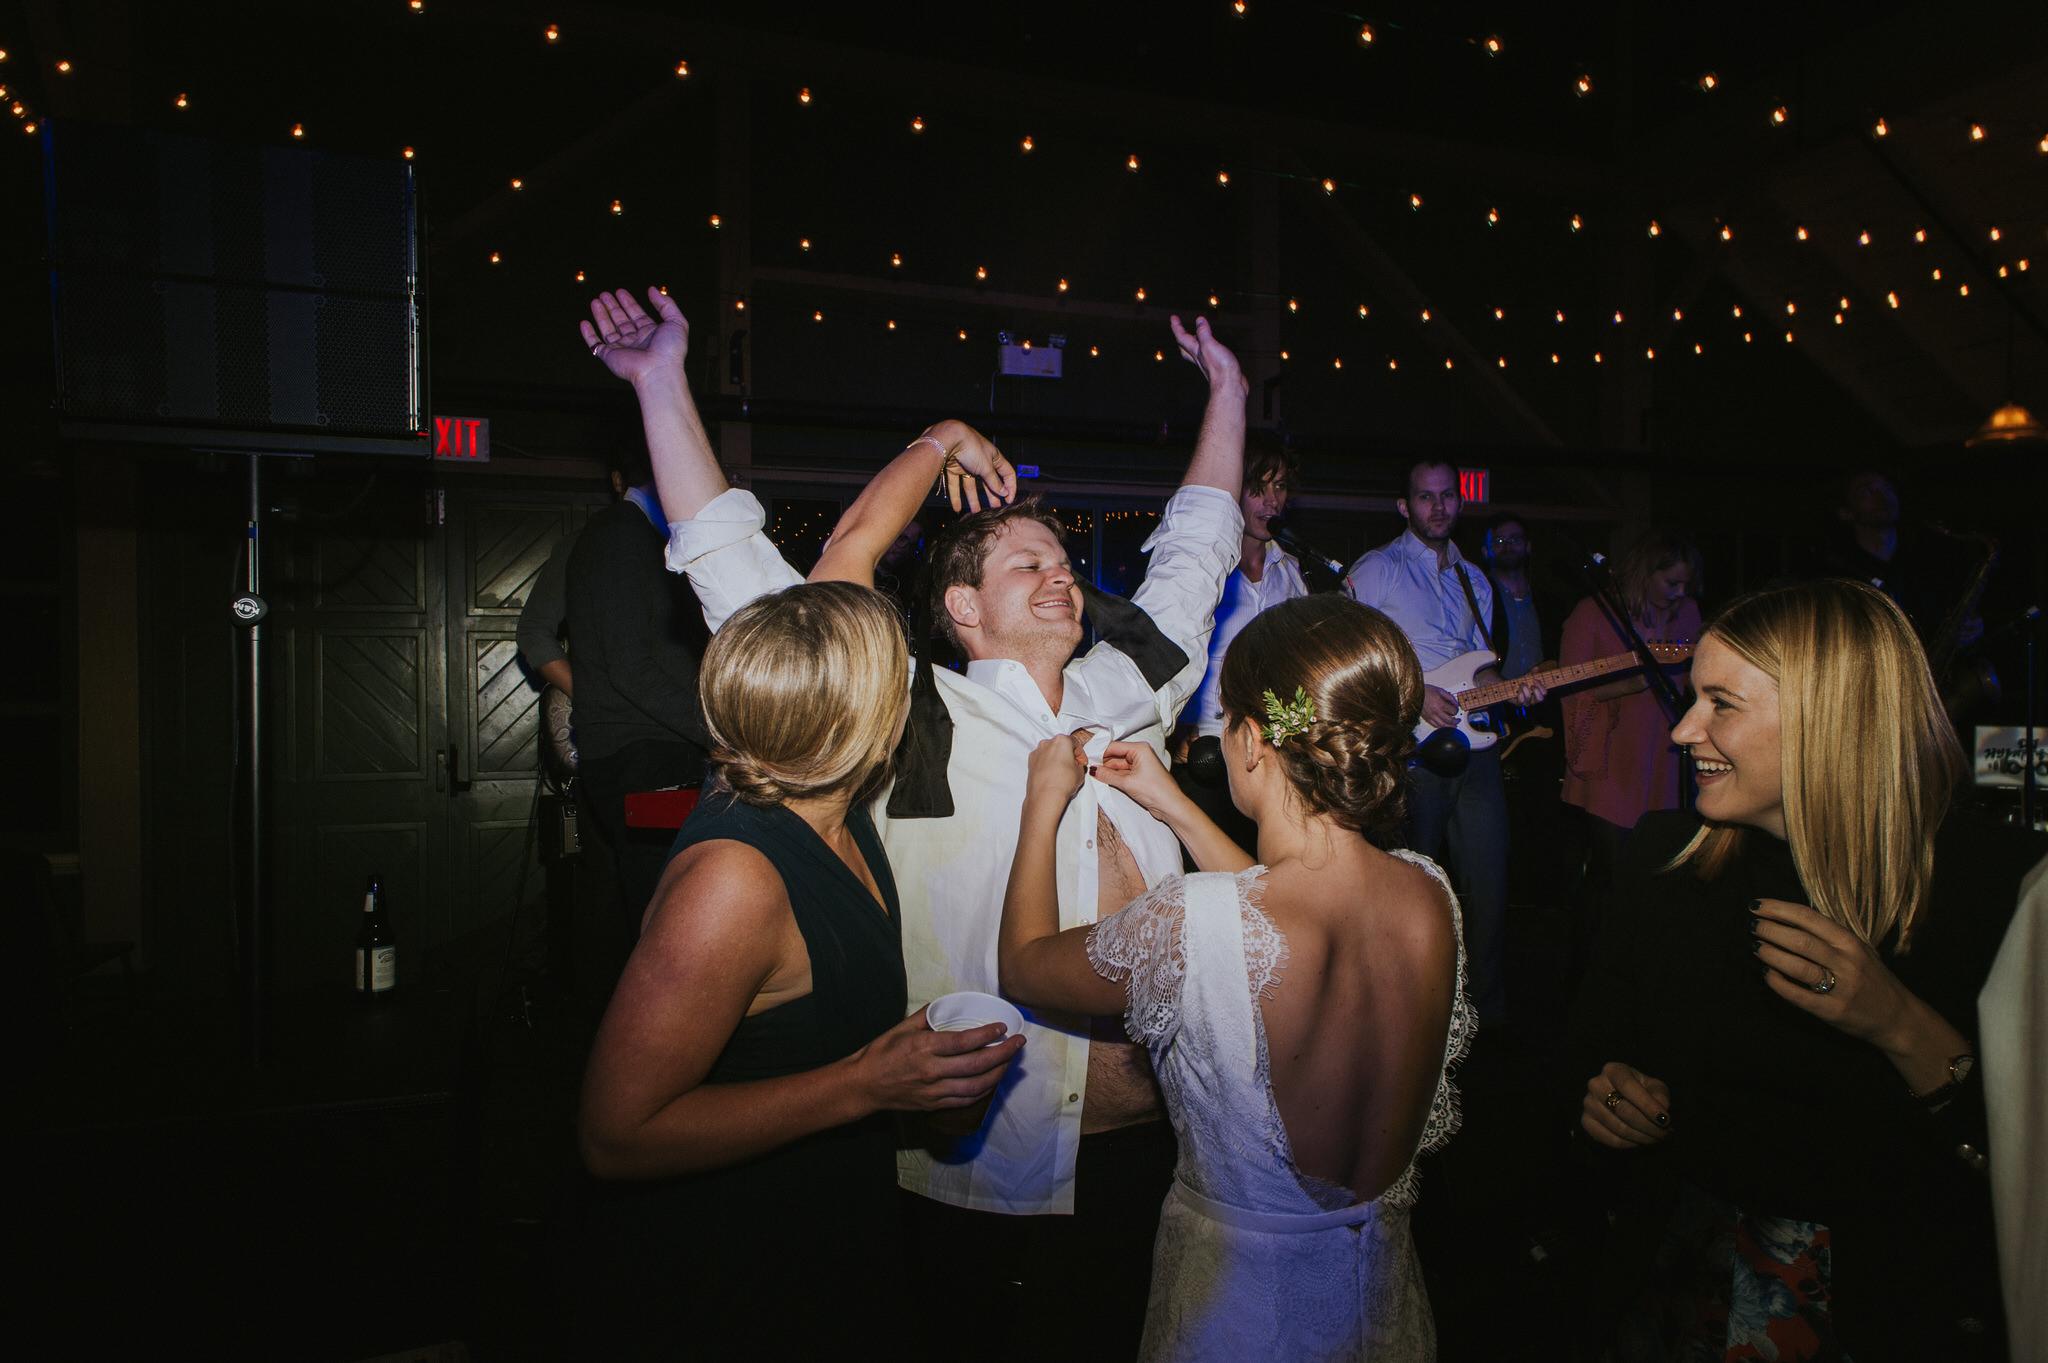 scarletoneillphotography_weddingphotography_prince edward county weddings233.JPG